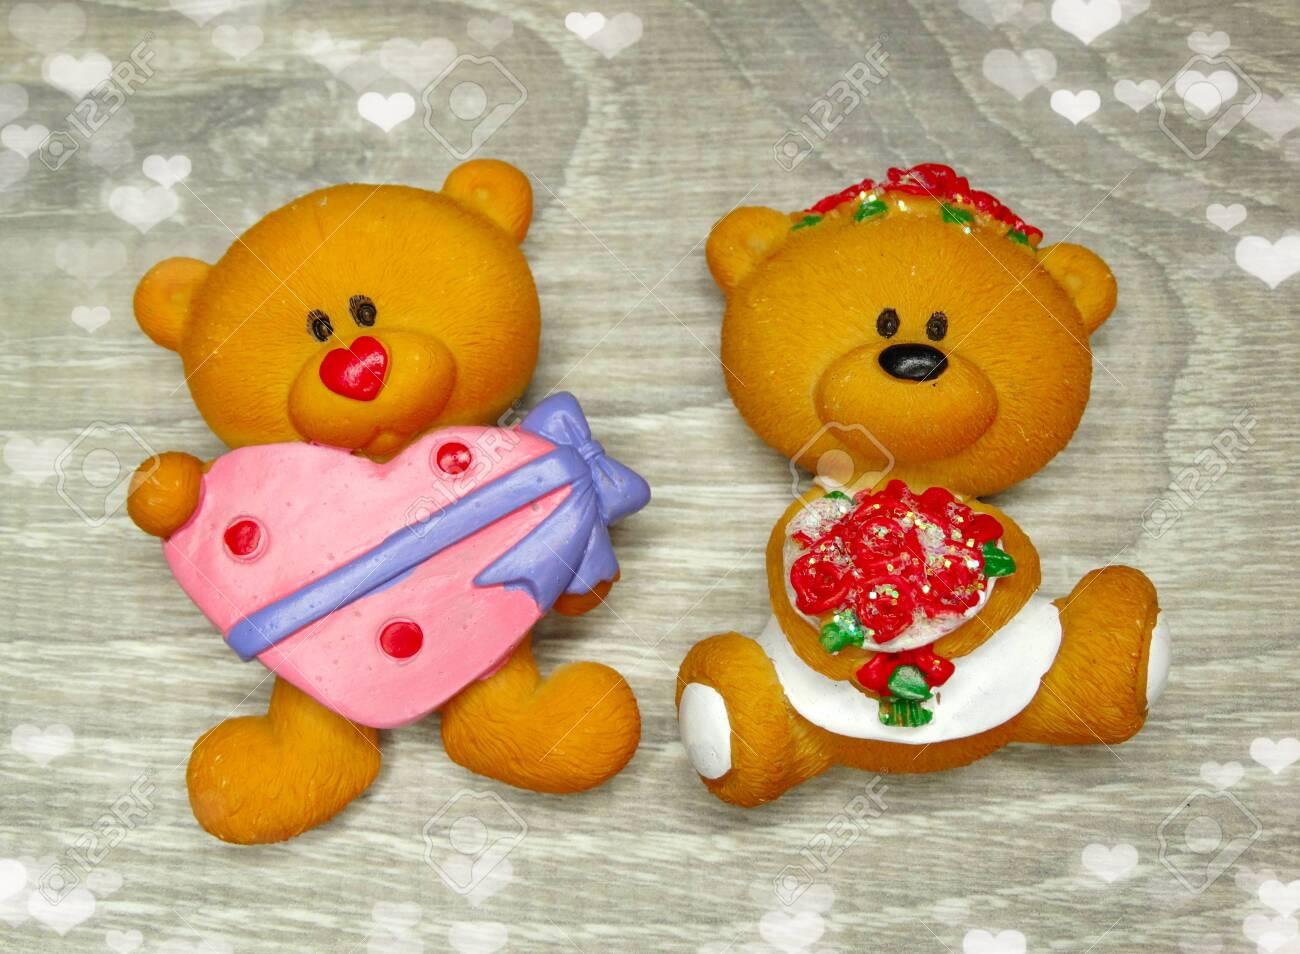 Valentine  Love Fabric PANEL to Sew 3-8 x 8 Ready to Sew Valentine  Share Love Teddy Bear Bear with Hearts Appliqu\u00e9 Pillow etc